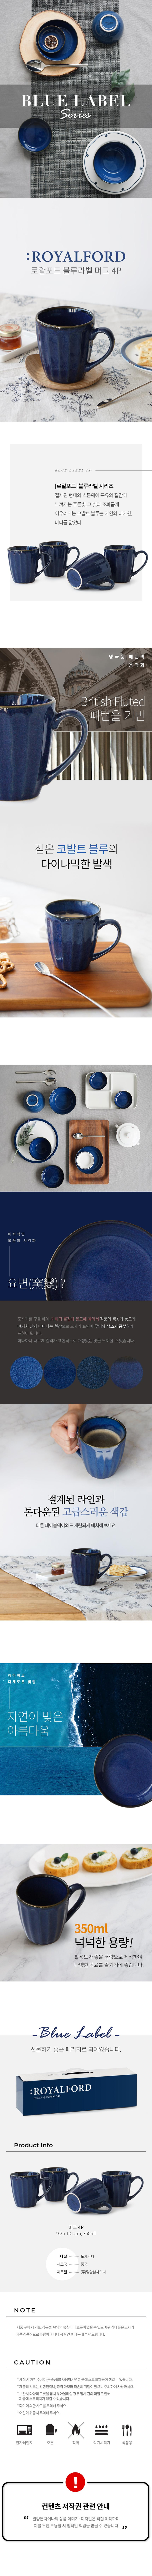 bluelabel_mug4p_long.jpg